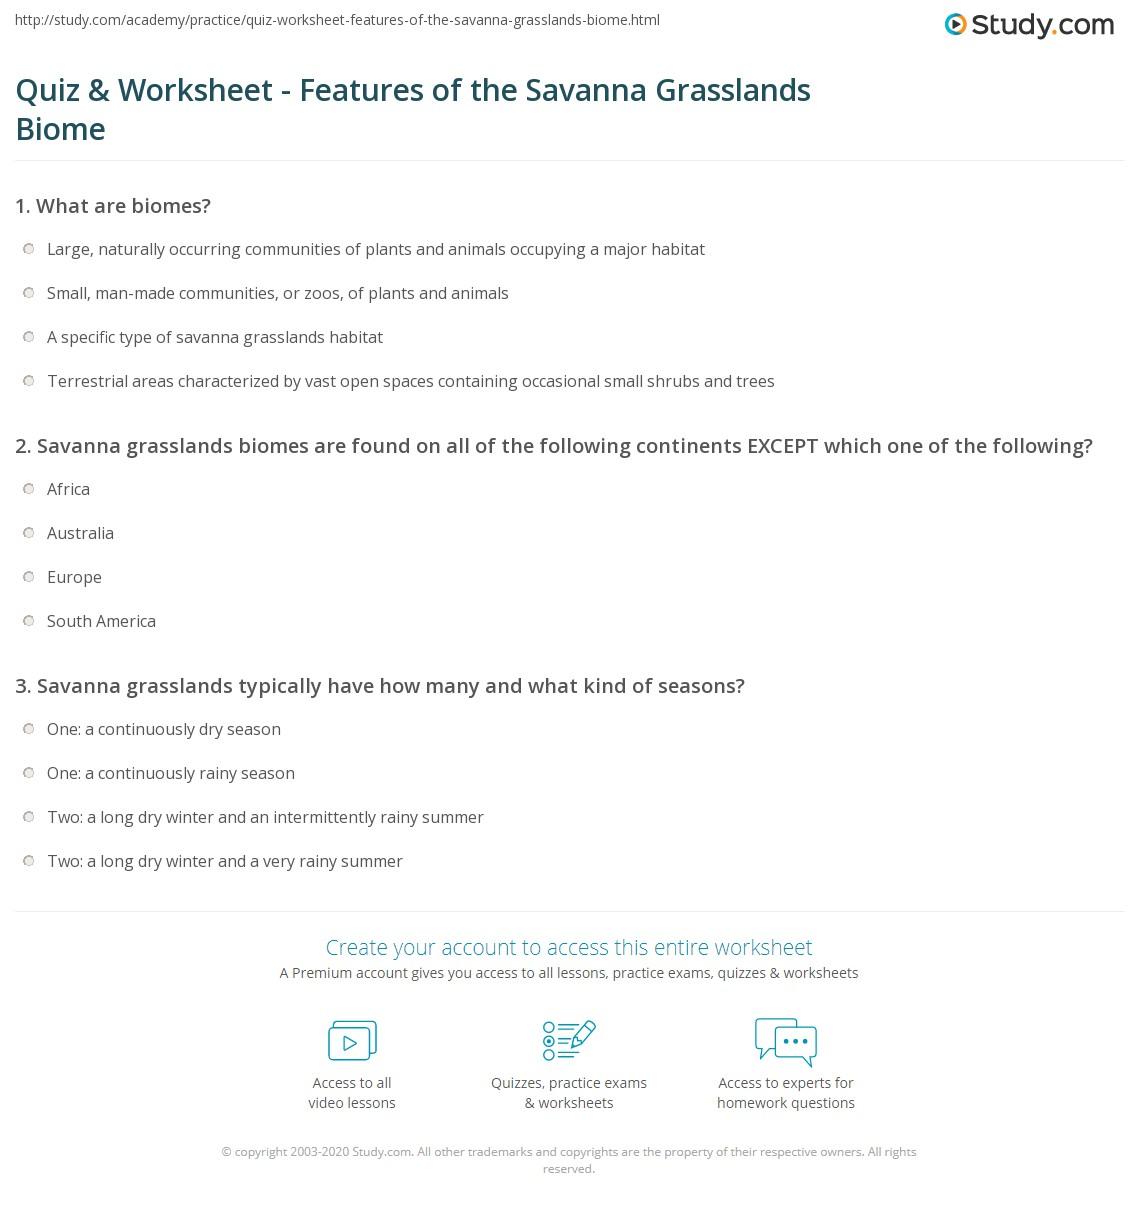 Worksheets Biome Worksheets quiz worksheet features of the savanna grasslands biome print definition examples worksheet